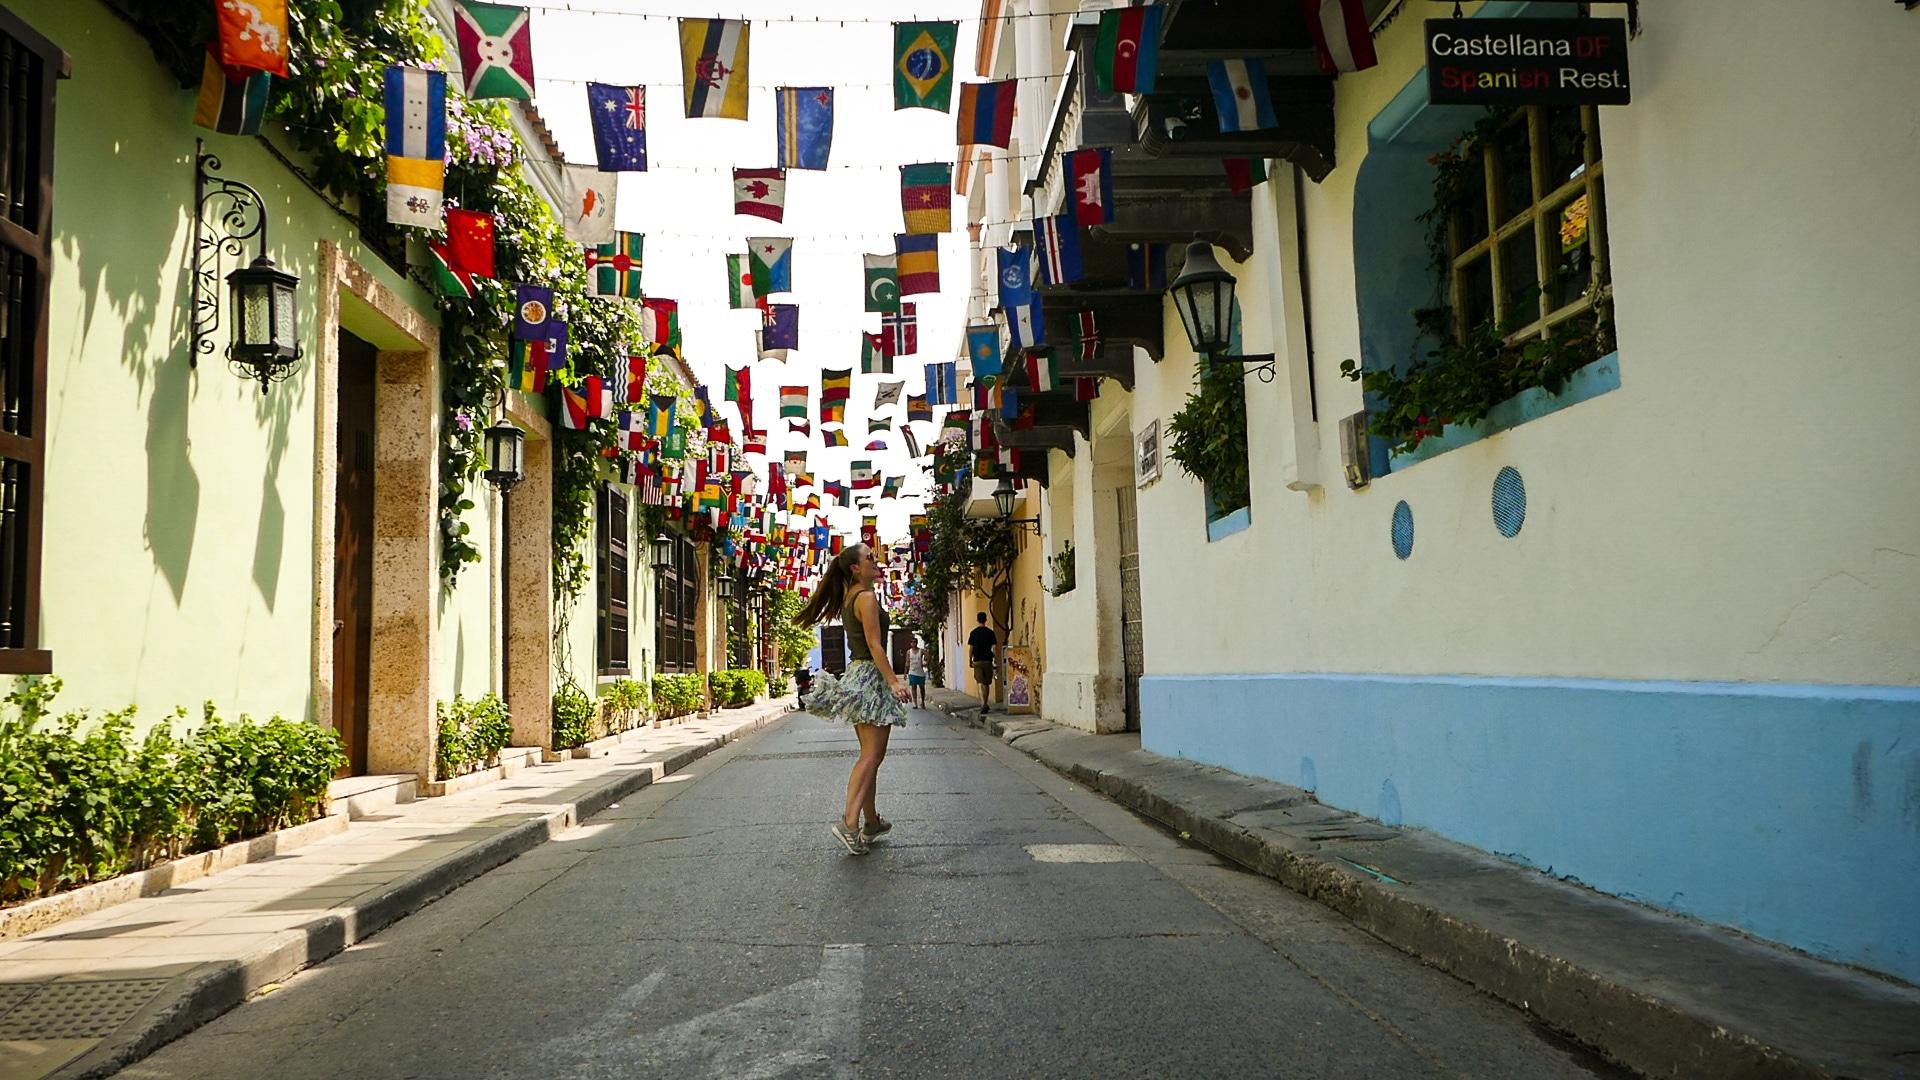 Cartanega, Colombia